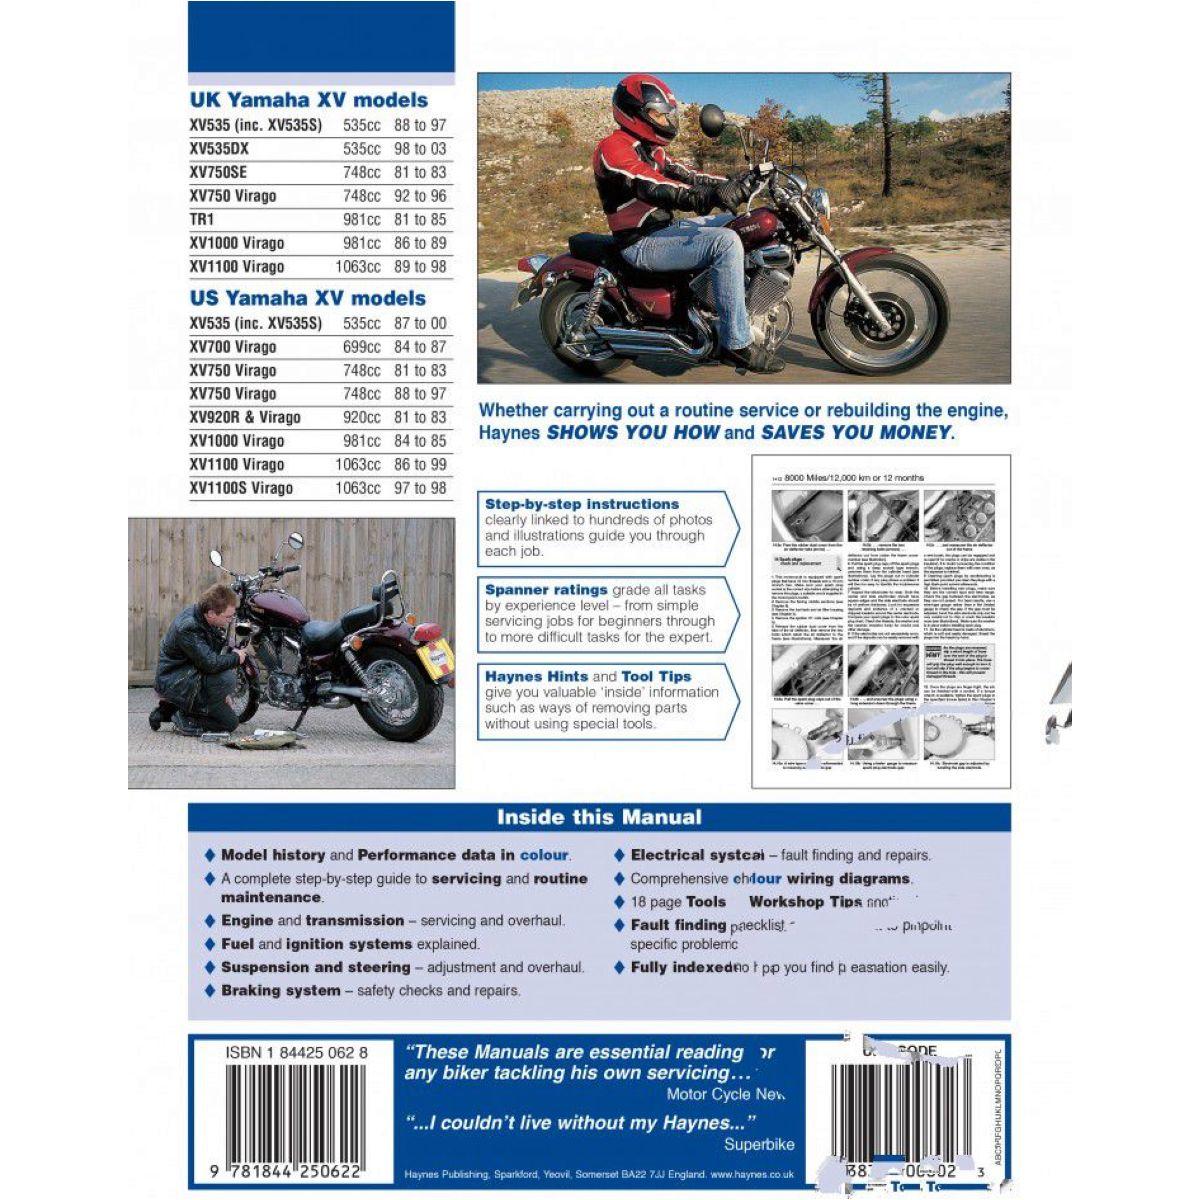 Reparatur Anleitung Yamaha 0802 Fr Xv Virago 89 Wiring Diagram Gussrad 1100 3lp 1989 1990 61 Ps 45 Kw